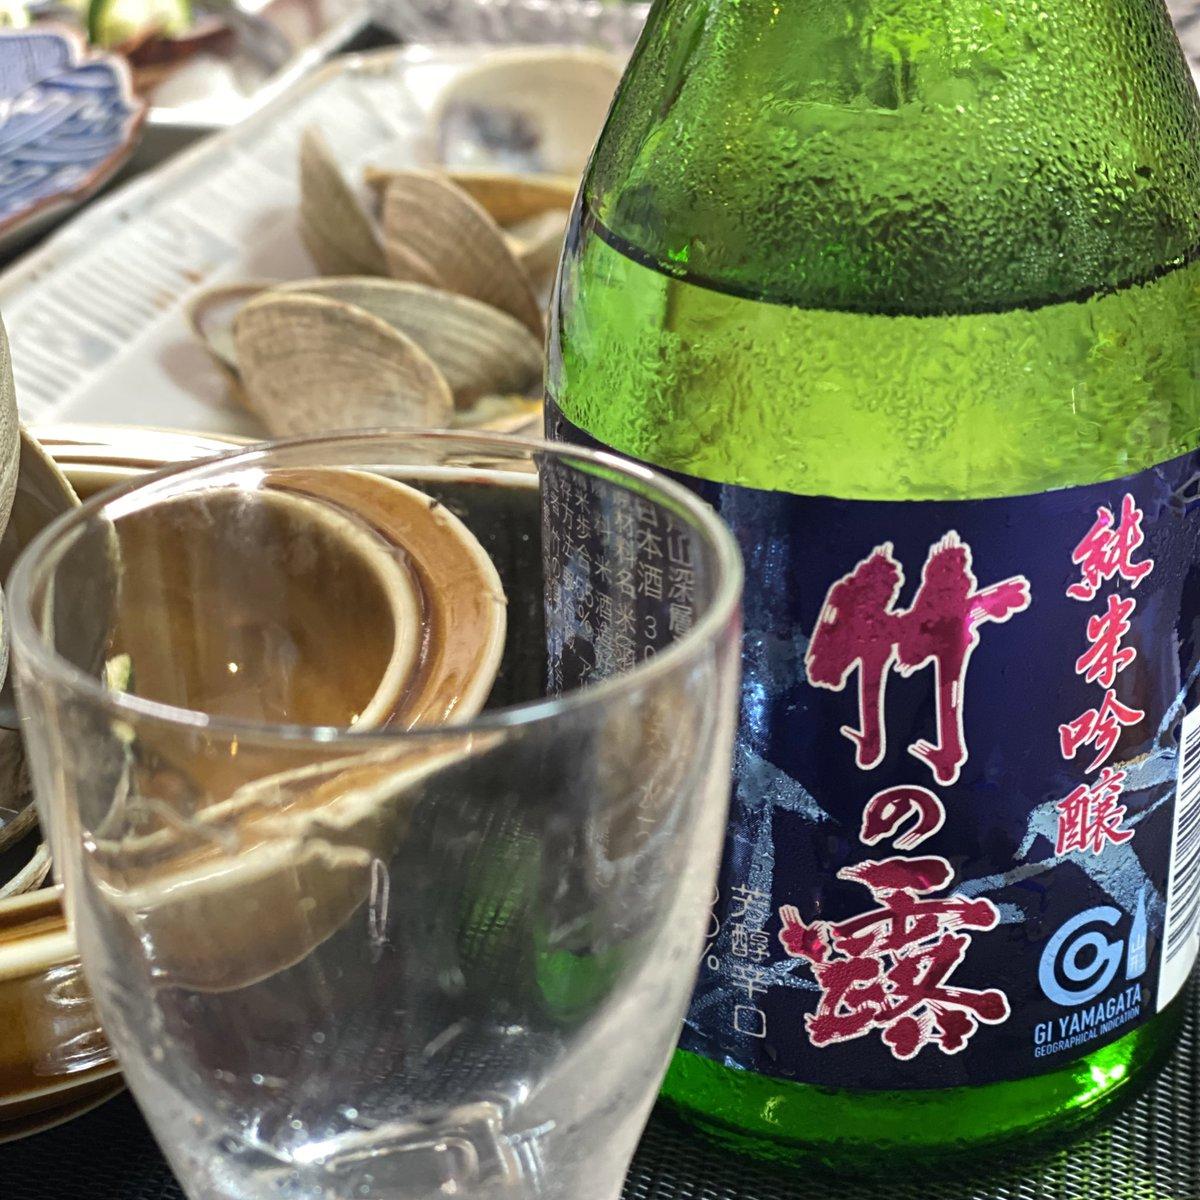 test ツイッターメディア - 本日の日本酒は亀の井酒造の「くどき上手」そして竹の露の「純米吟醸 竹の露」。 極楽極楽。 https://t.co/sXzOCaVXDC